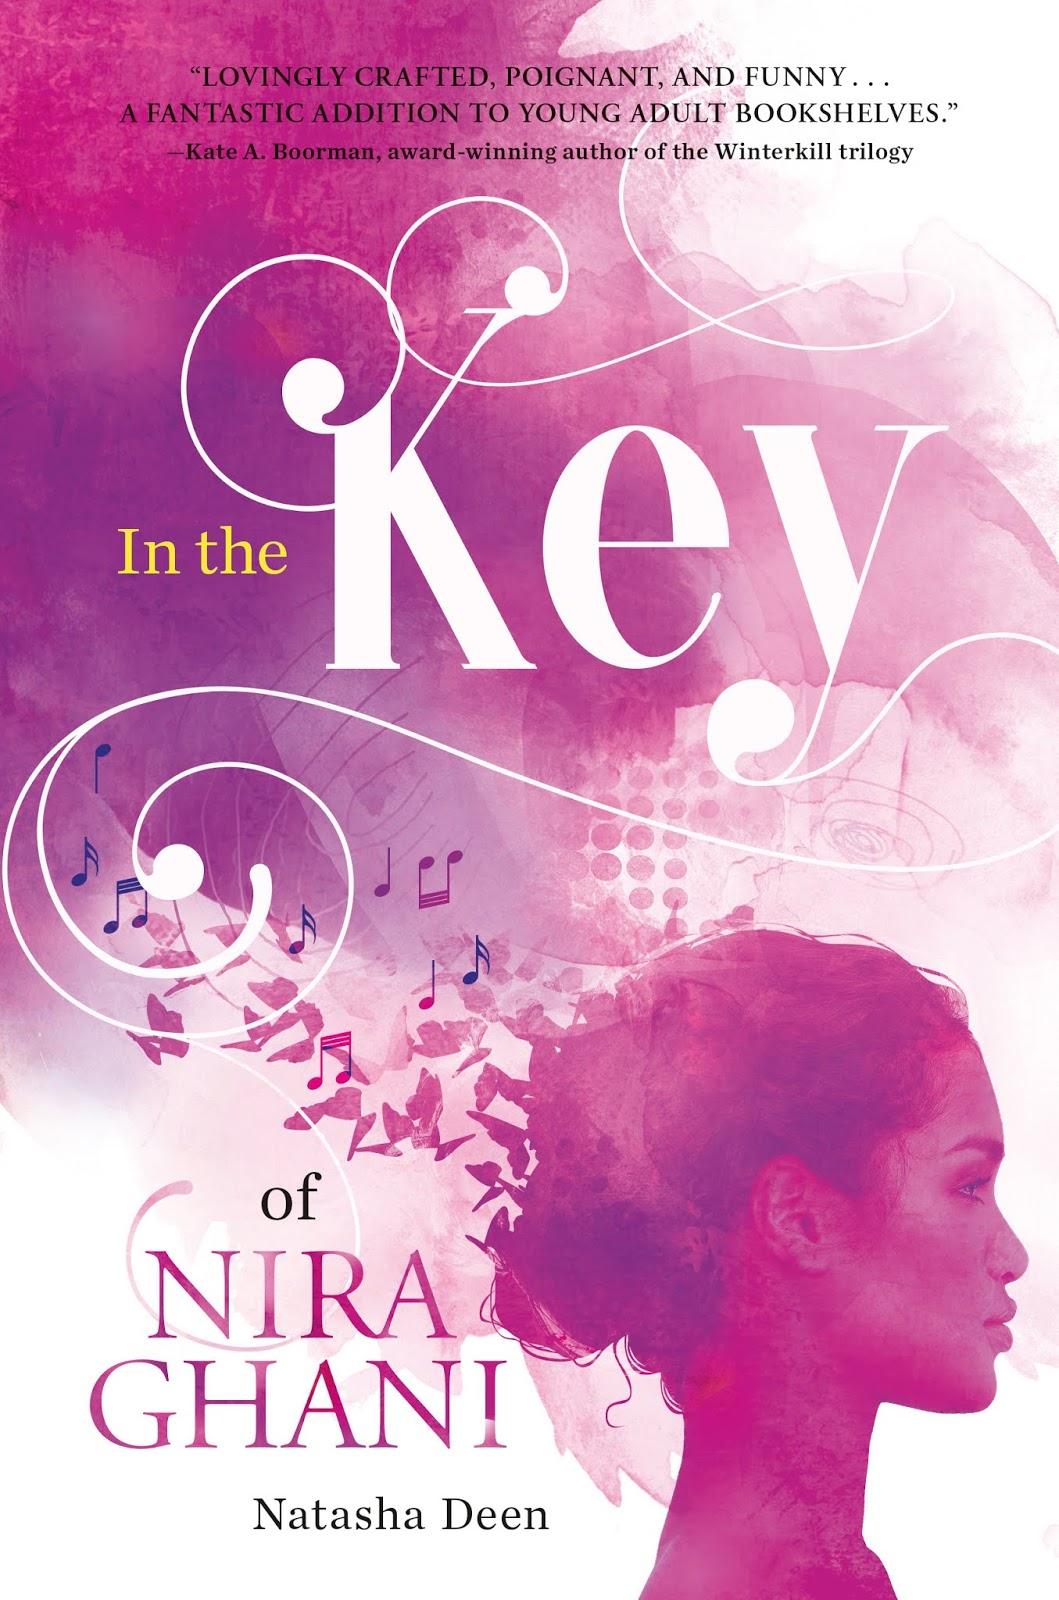 Interview with novelist Natasha Deen